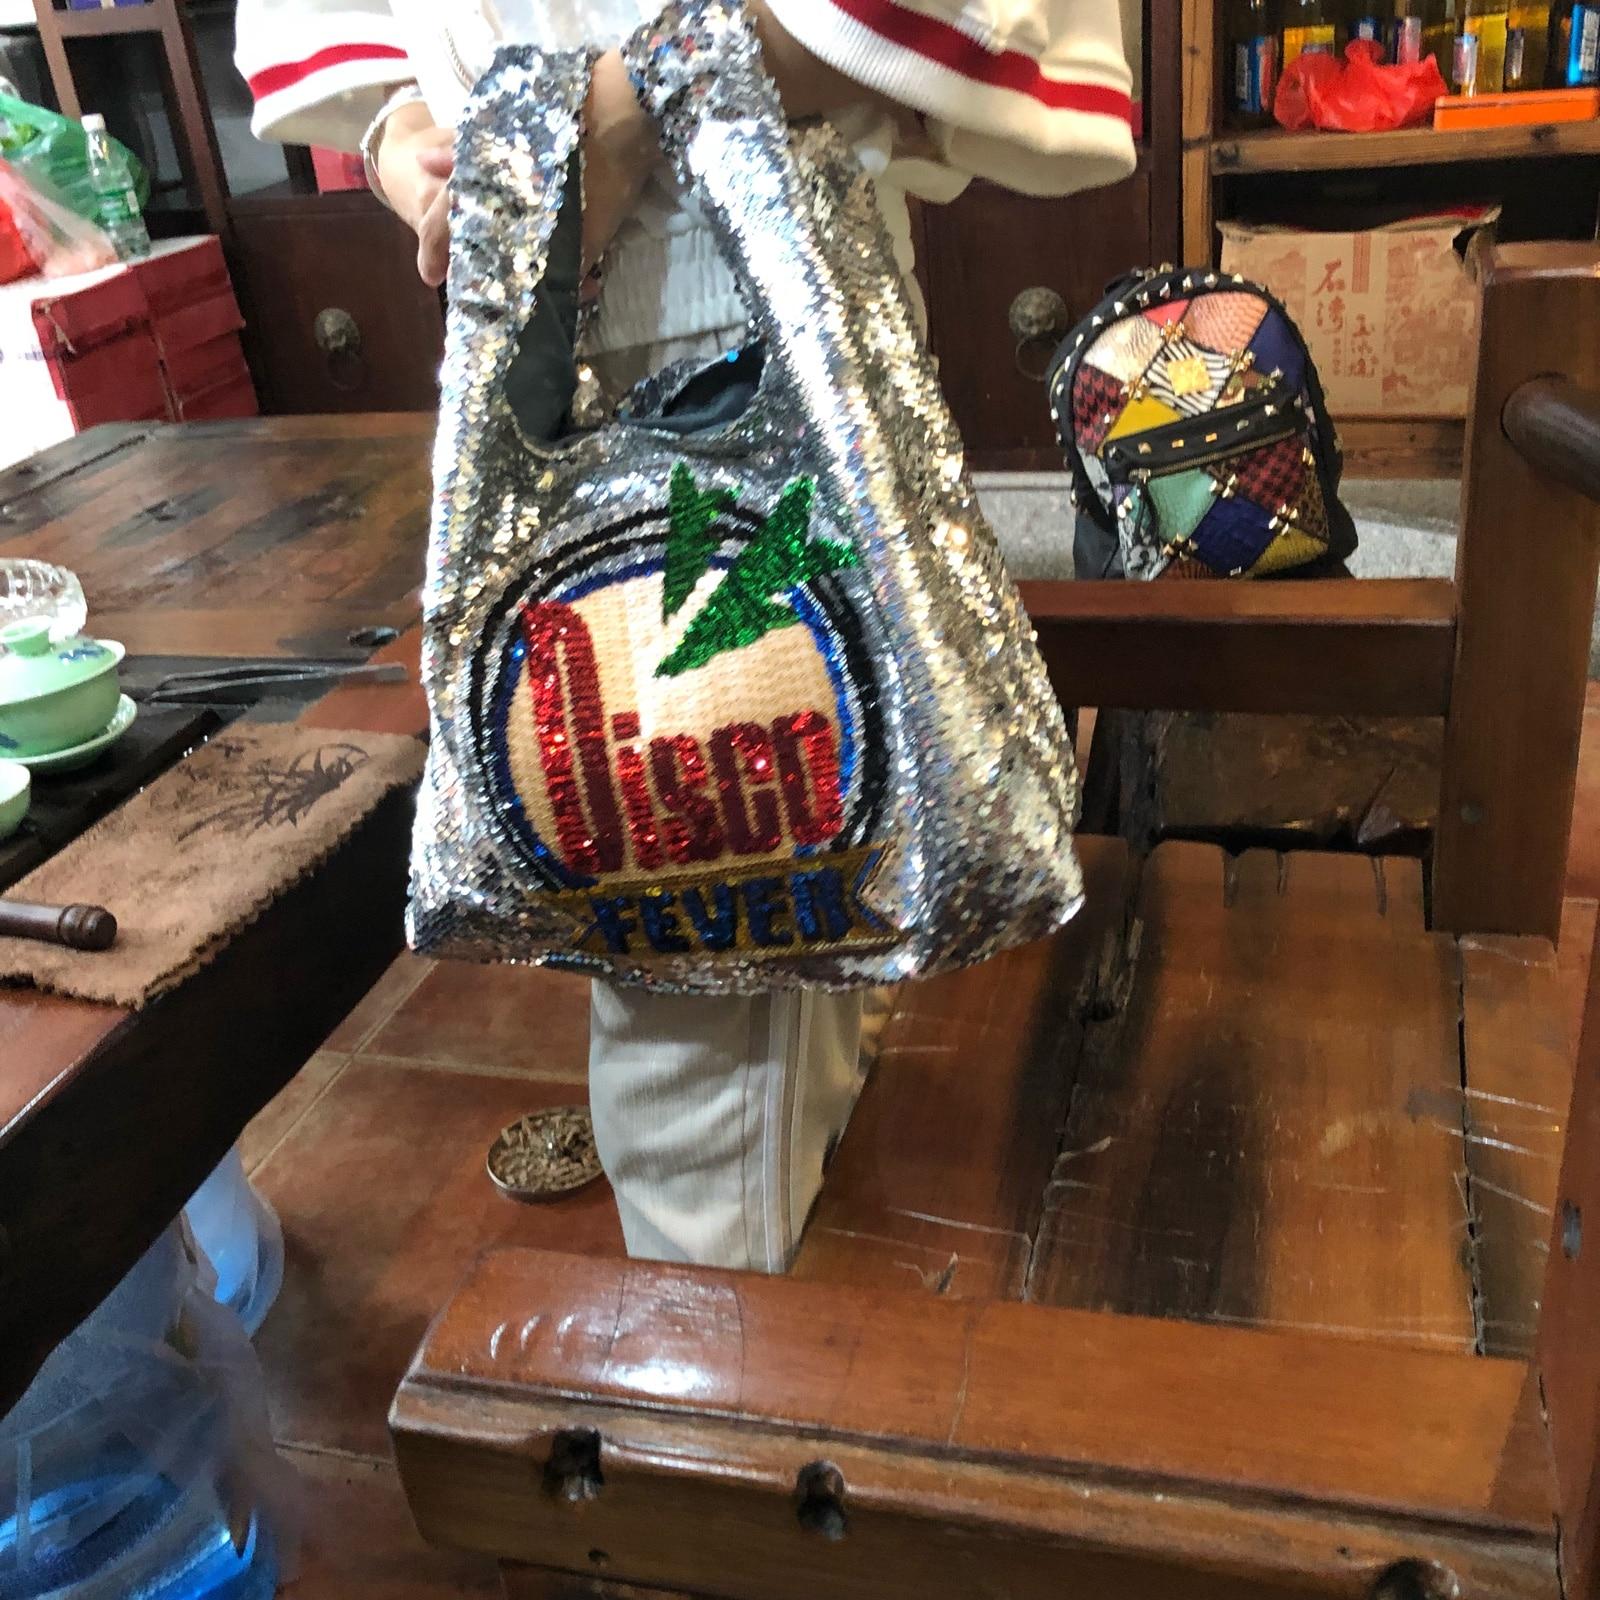 Disco Fashion Sequined Causal Tote Bag Large Beach Bag Beaded Blingbling Sliver Shoper Shopping Bag Luxury Lady Handbags louis